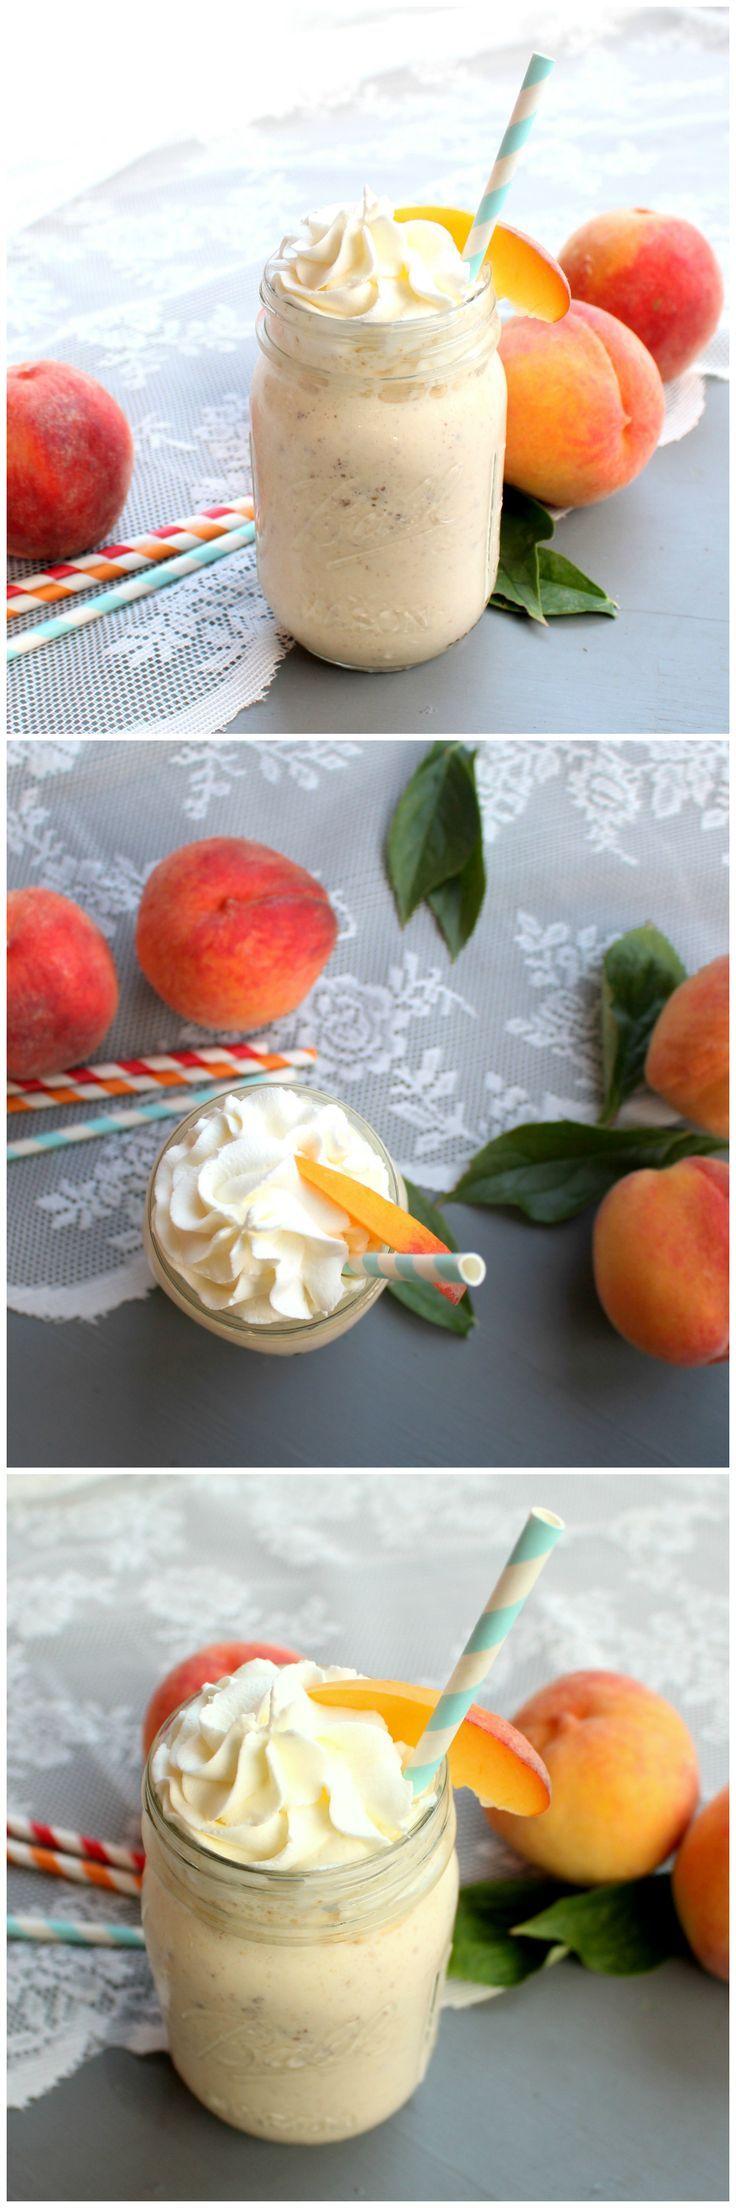 Brown Butter Peach Milkshake | www.chocolatewithgrace.com | #peach #milkshake